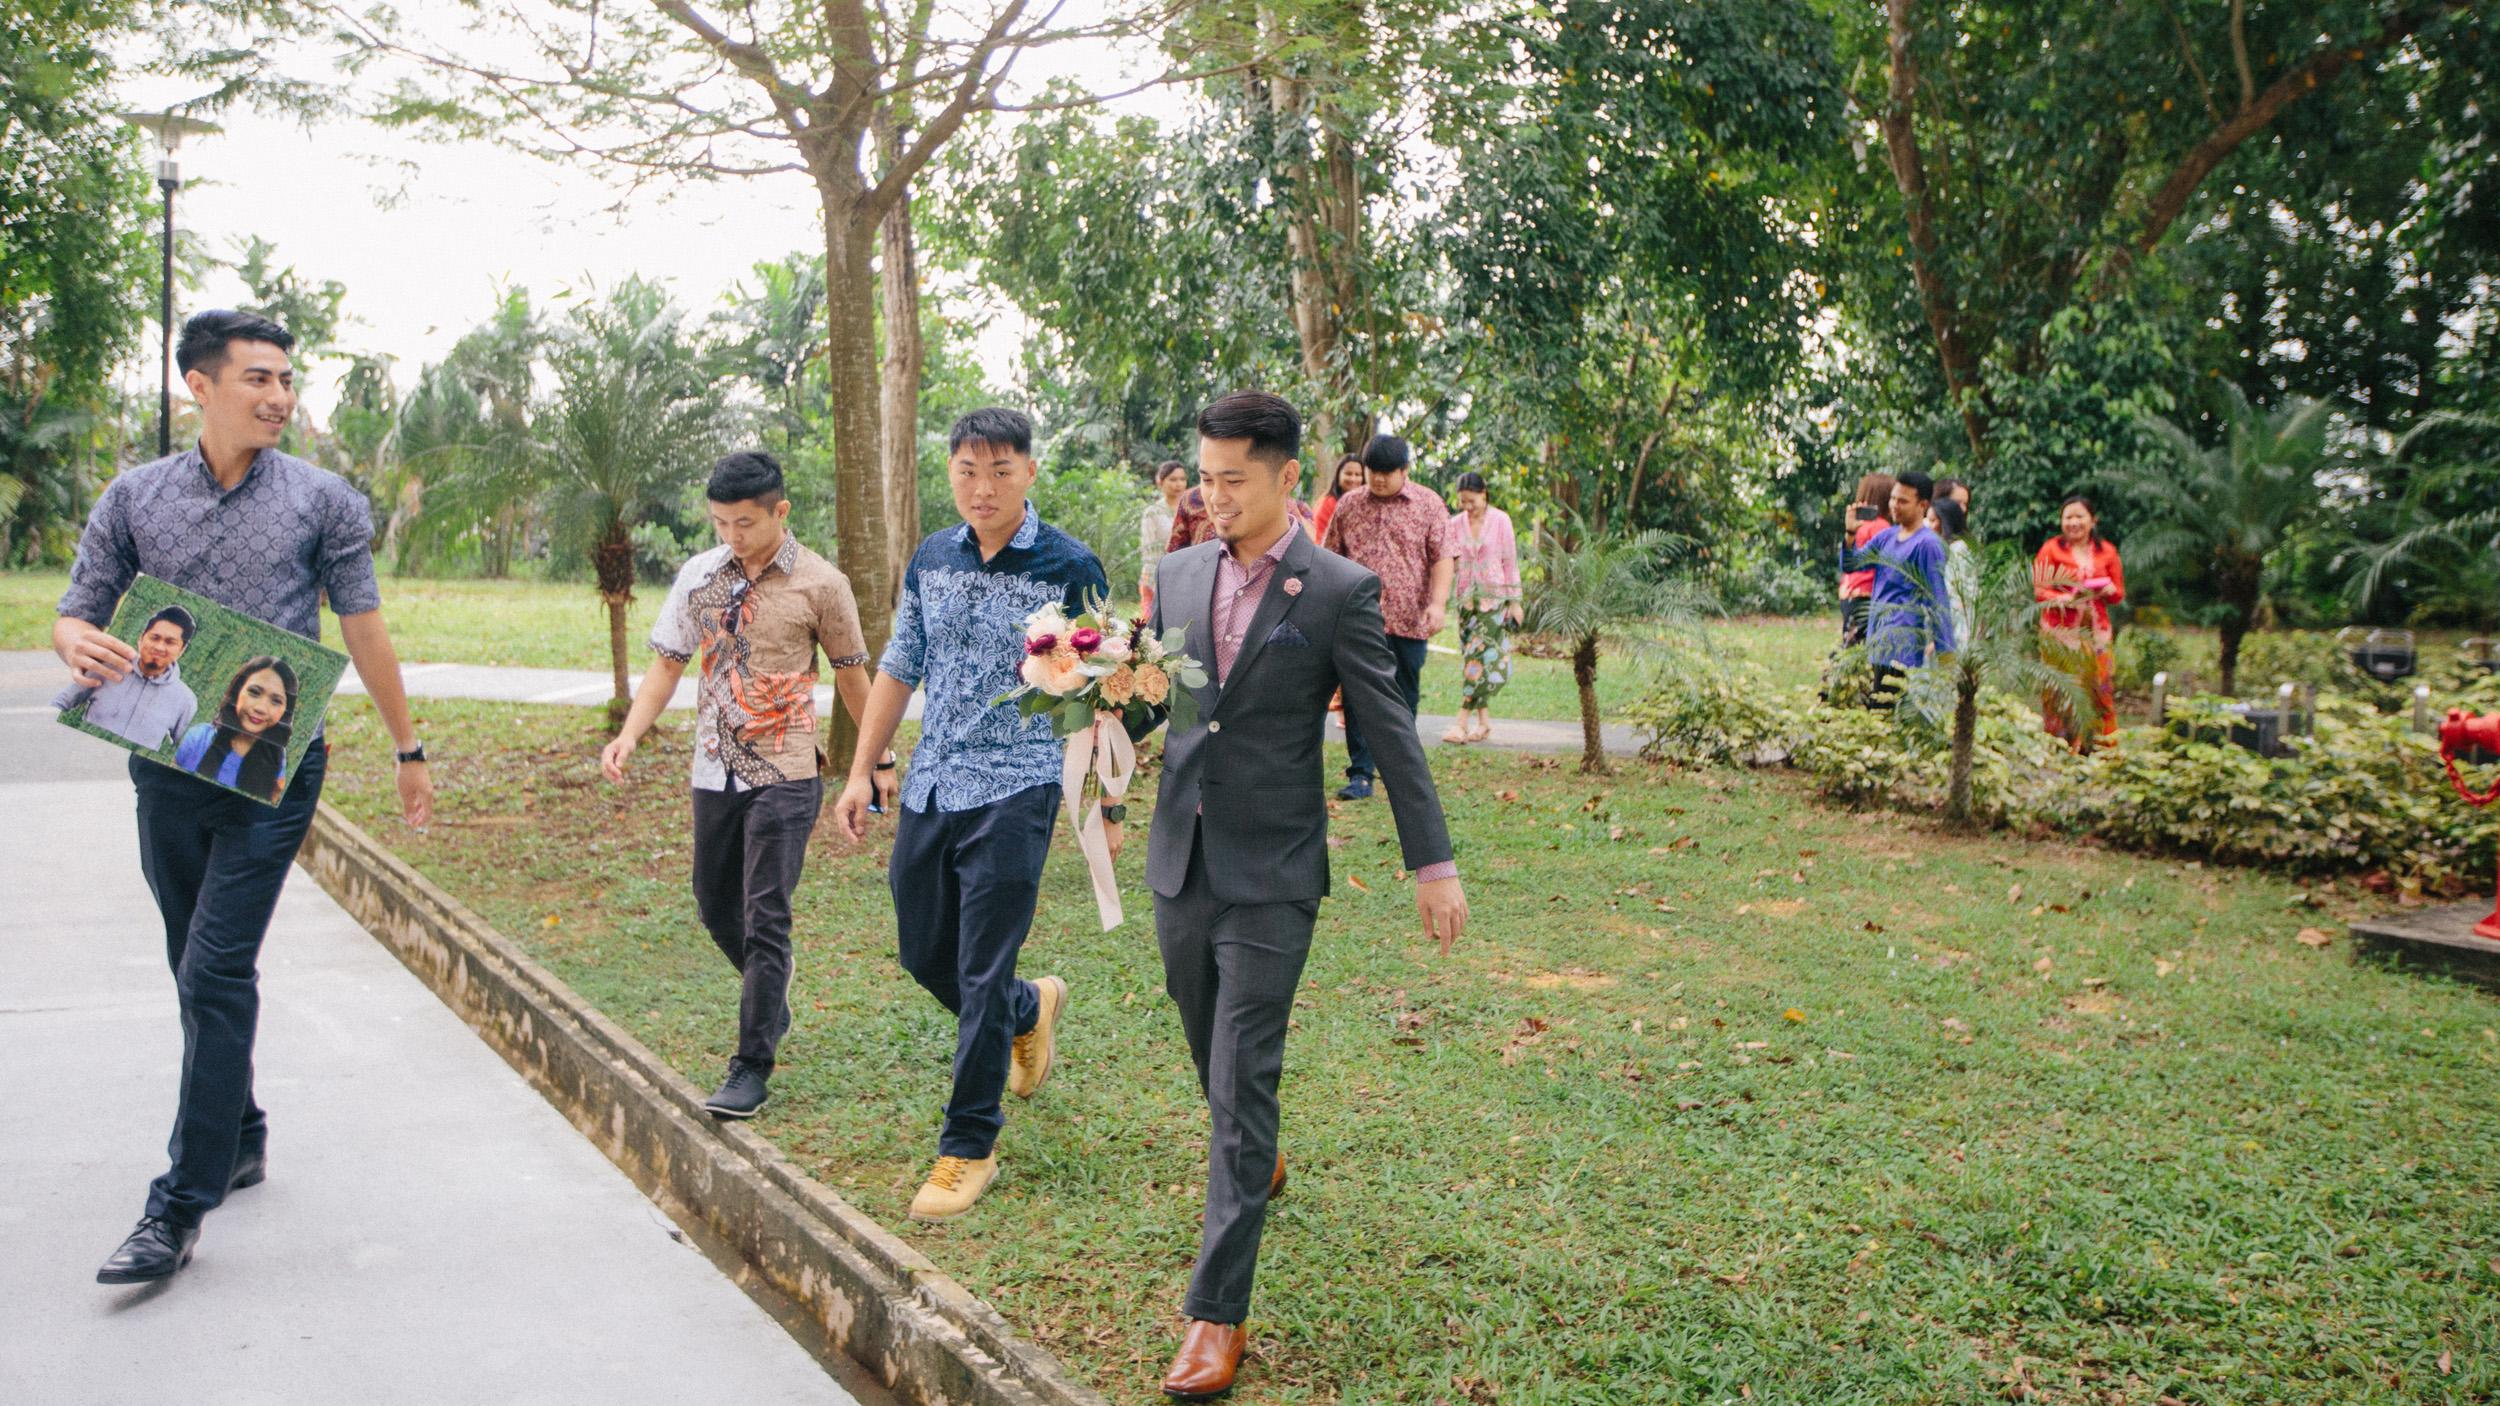 singapore-wedding-photographer-photography-wmt2017-029.jpg